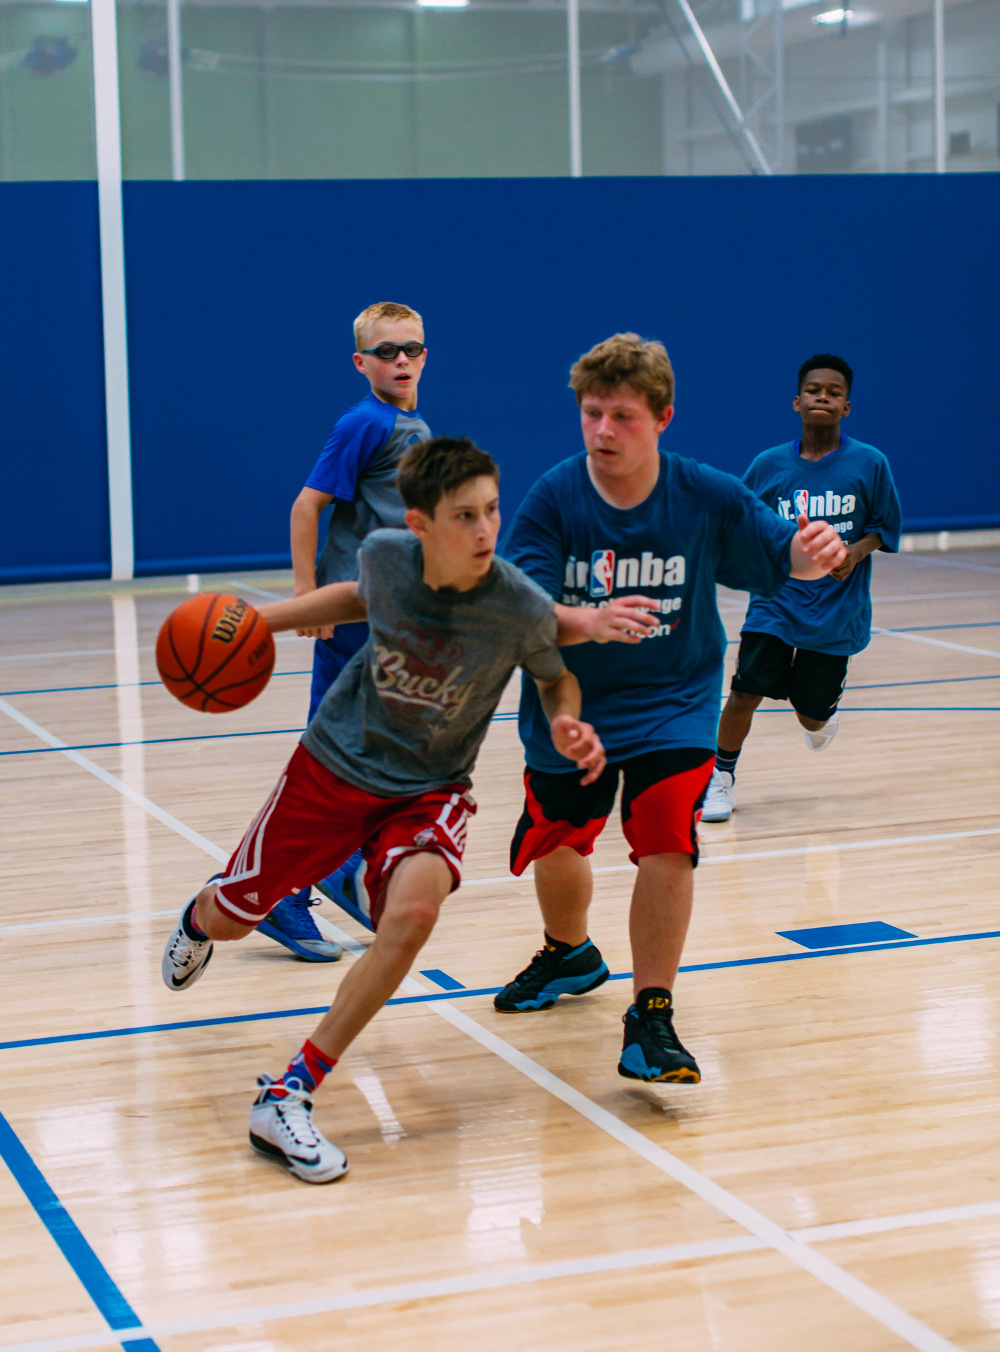 Basketball-09.jpg